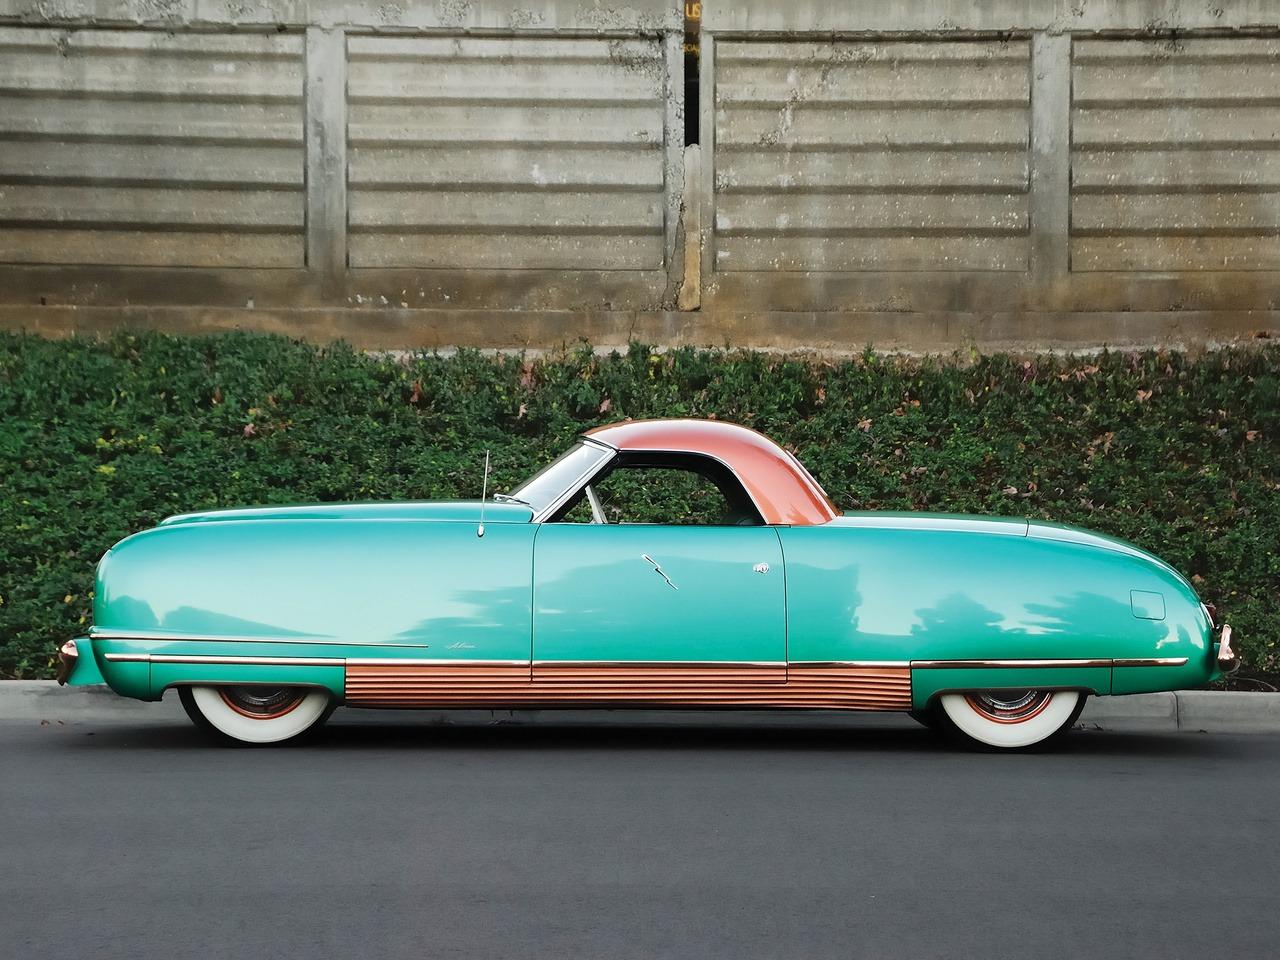 Chrysler Thunderbolt Concept Car on Renault 1940 Cars